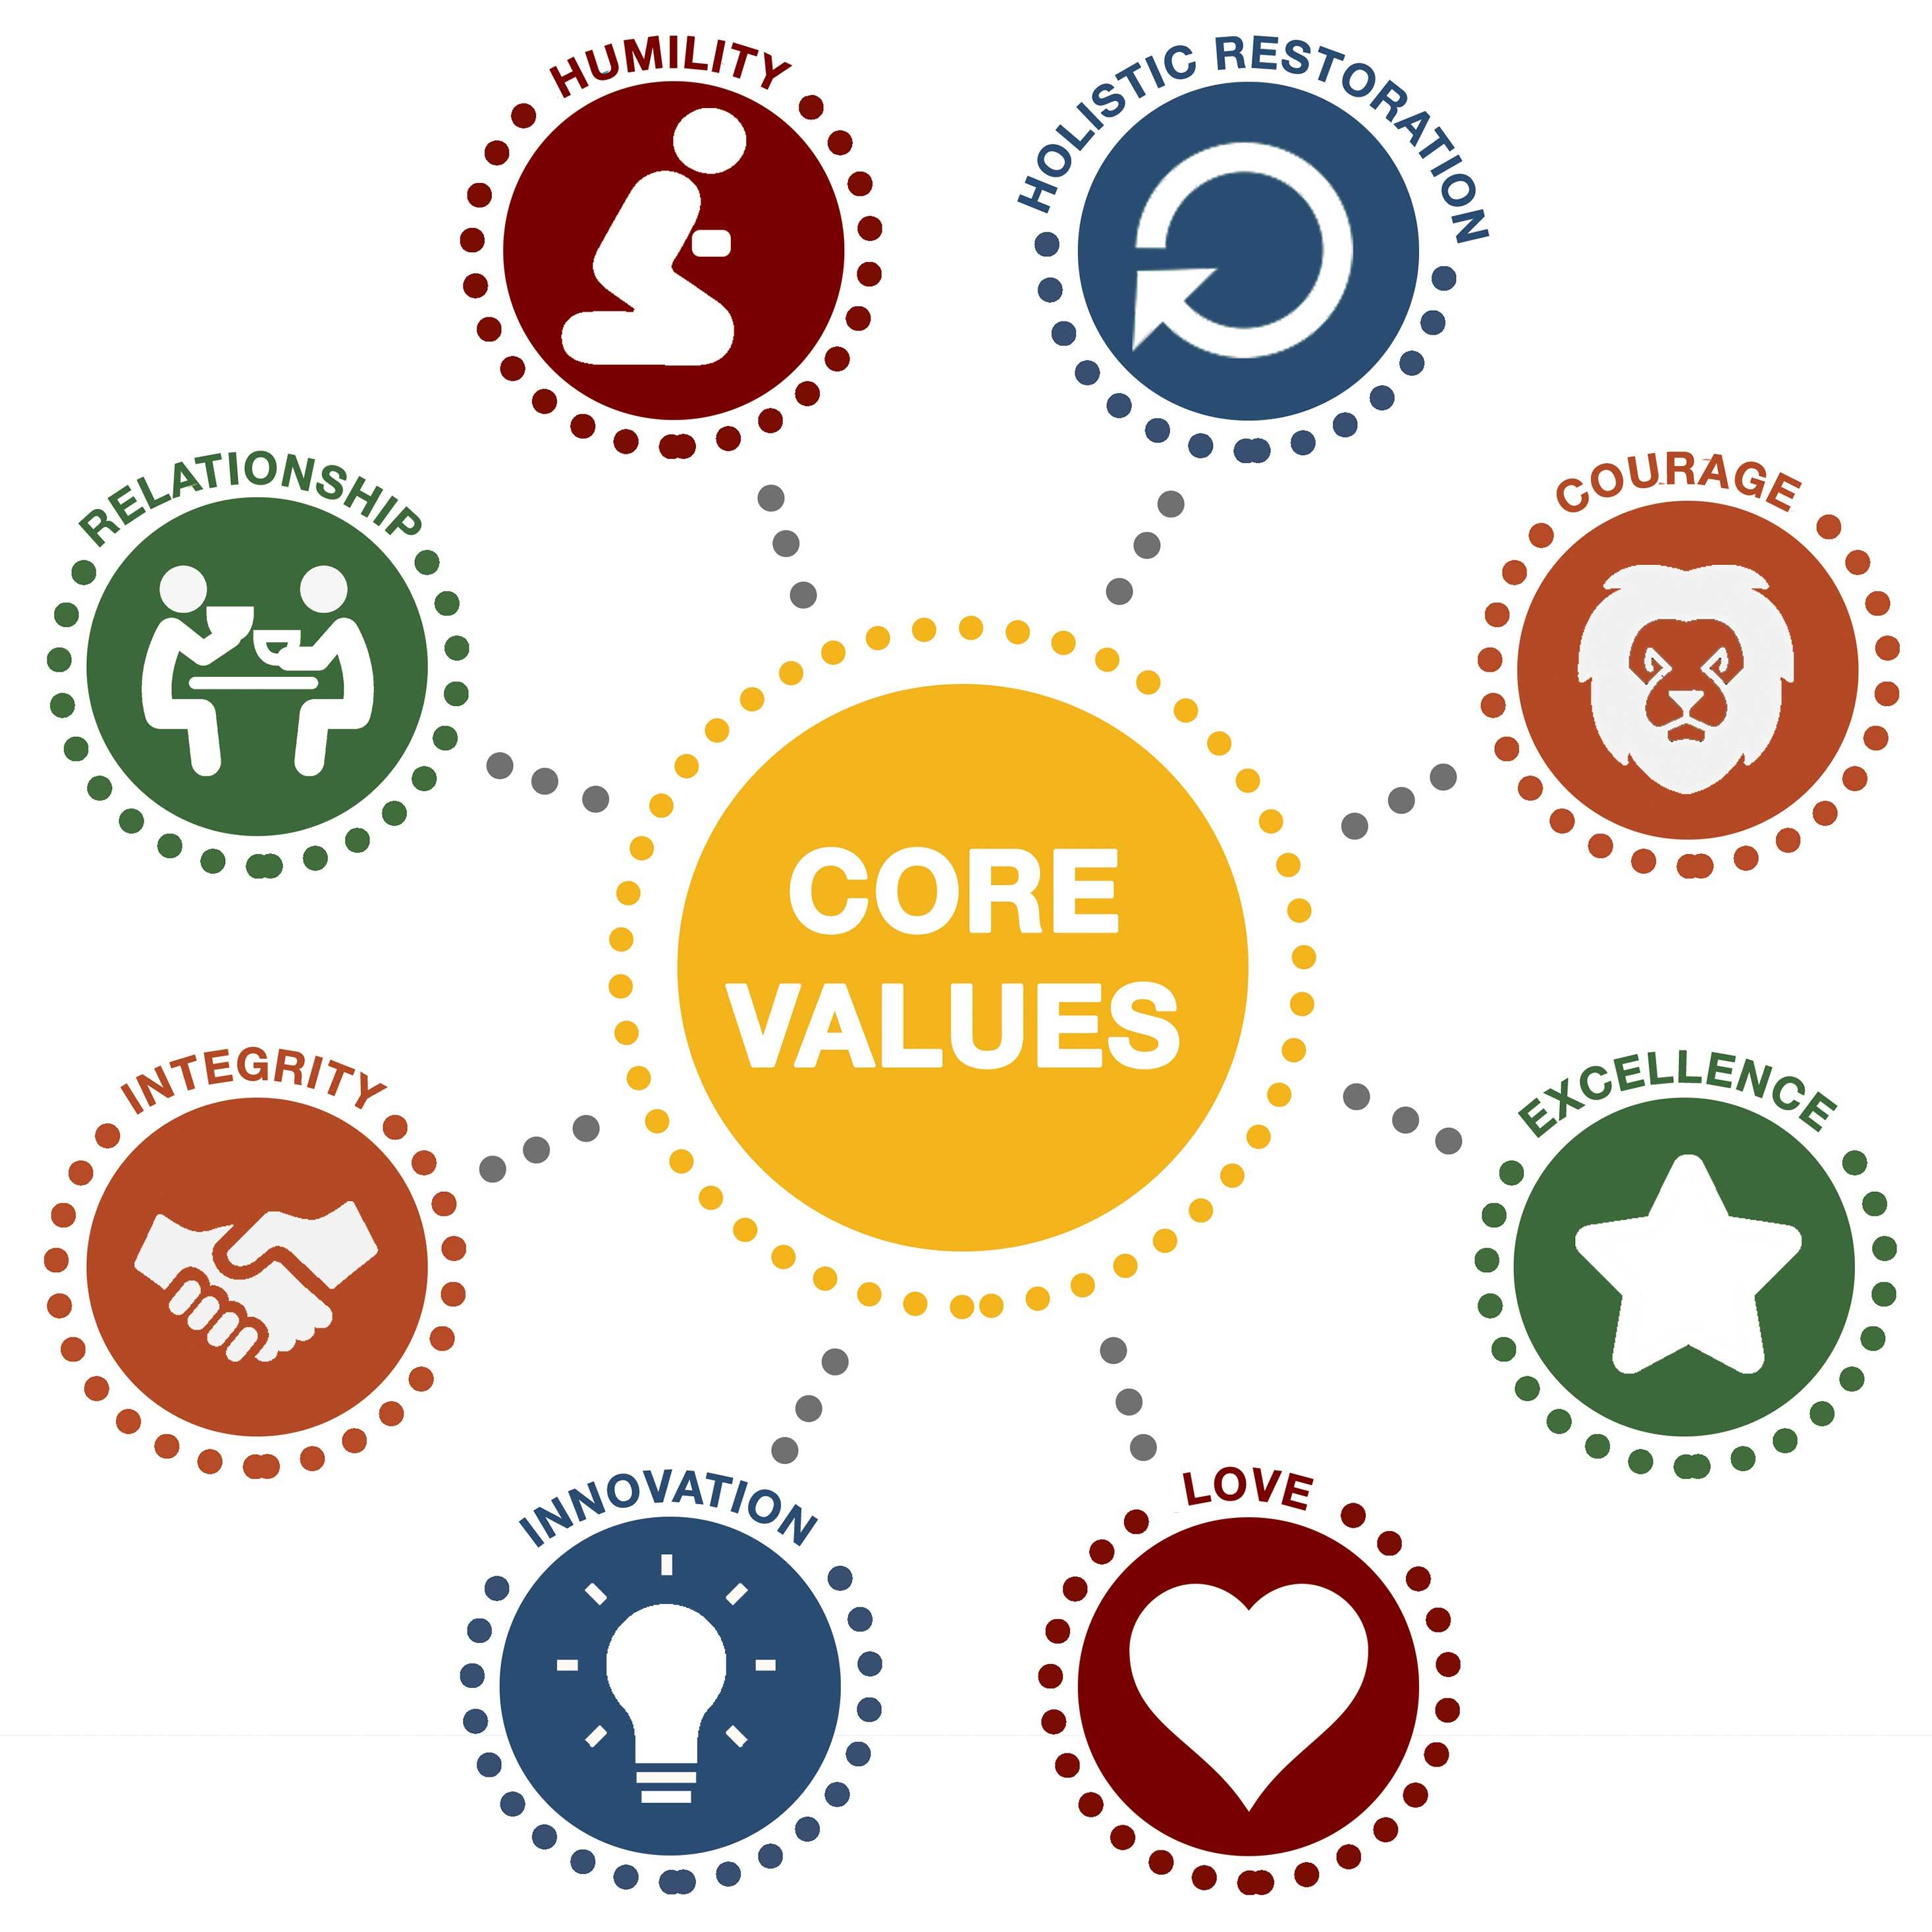 About_Core Values